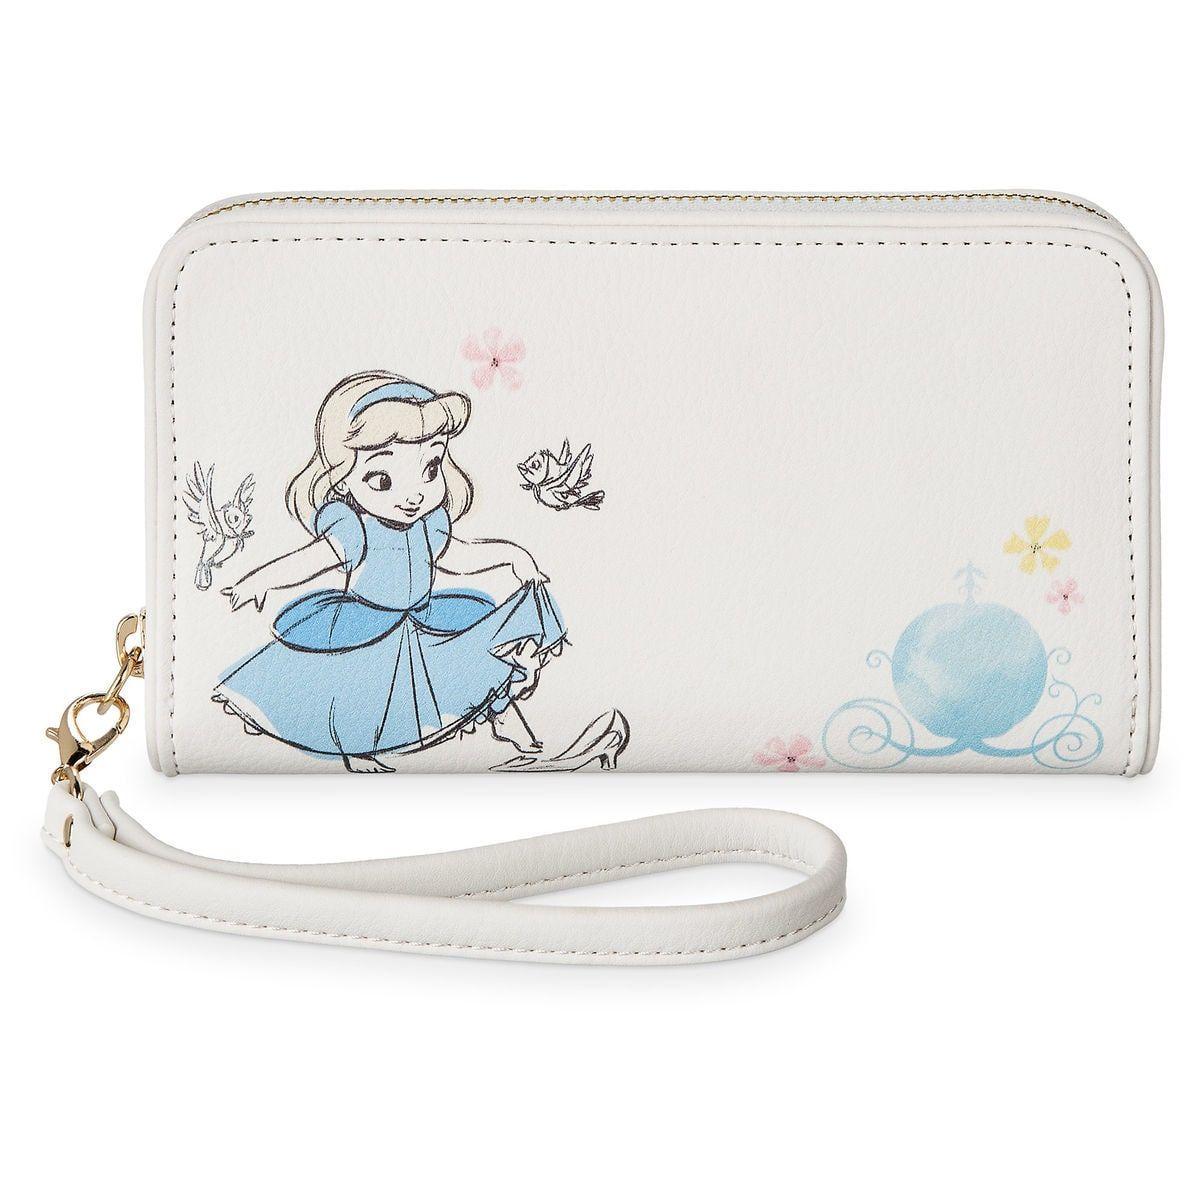 mode designer sur des coups de pieds de prix compétitif Disney Animators' Collection Cinderella Wallet | Wallets in ...